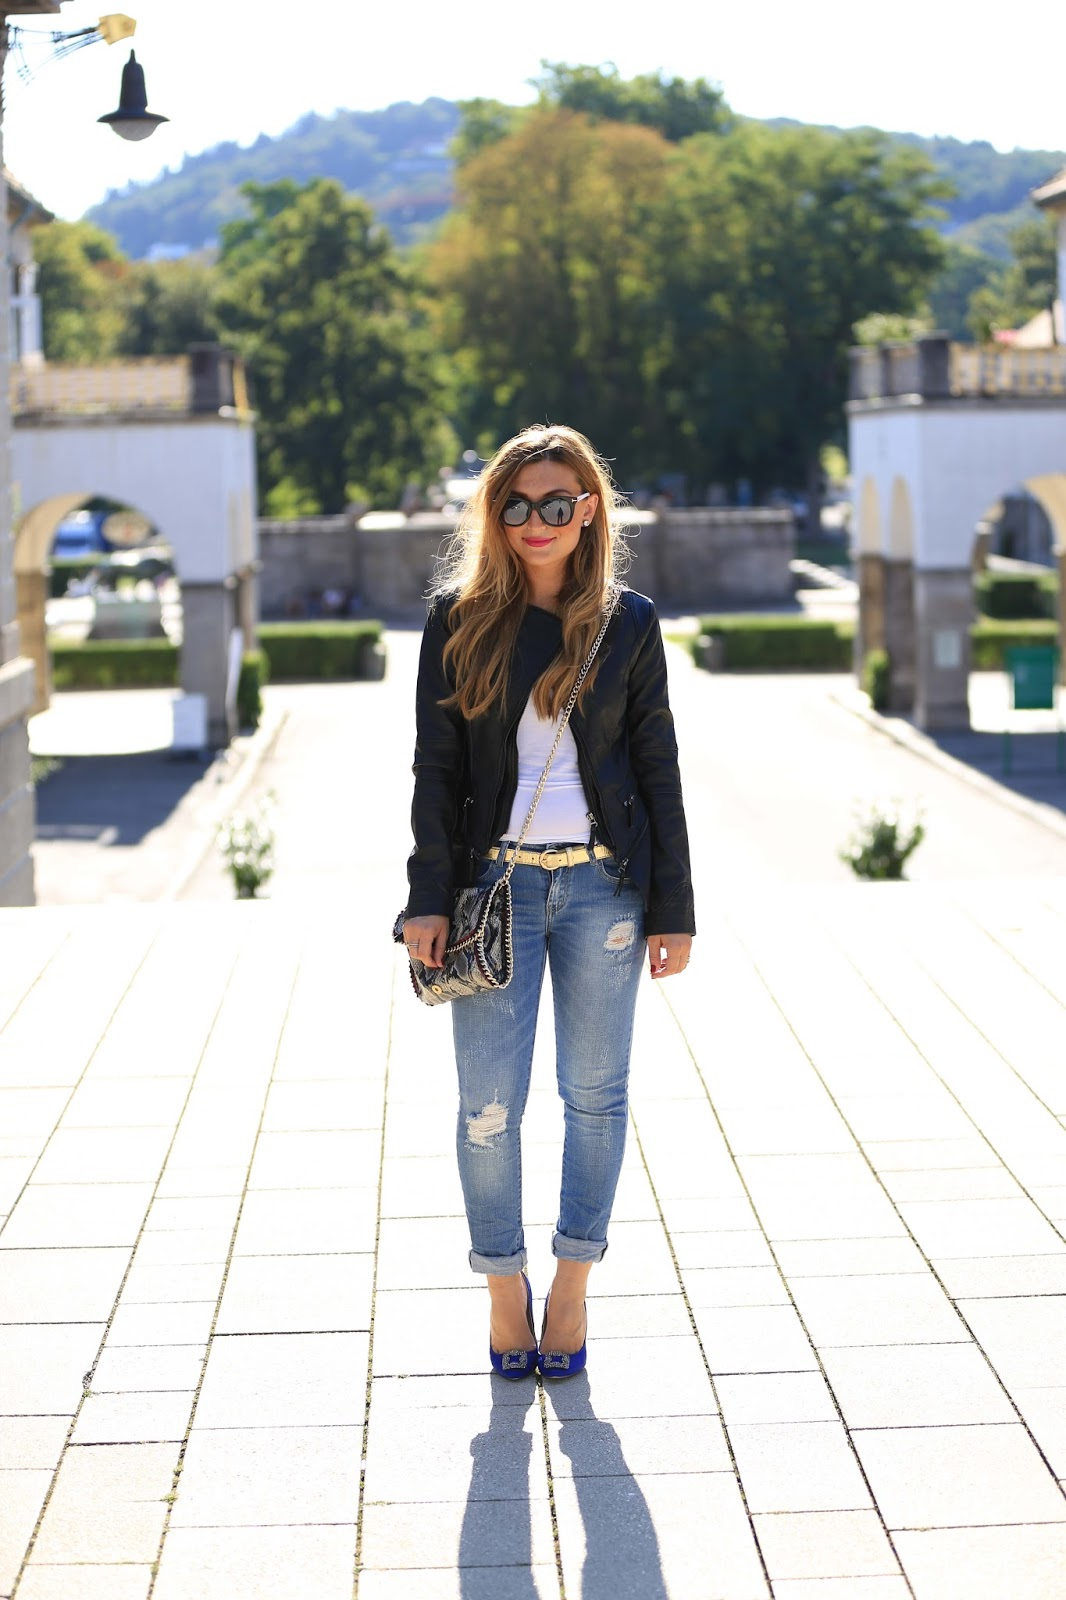 Manolo blanik - blaue Manolo Blanik- Zara-red heelsWolford-Dior-so-real-Fashionblogger-München-Deutschland-Lederjacke